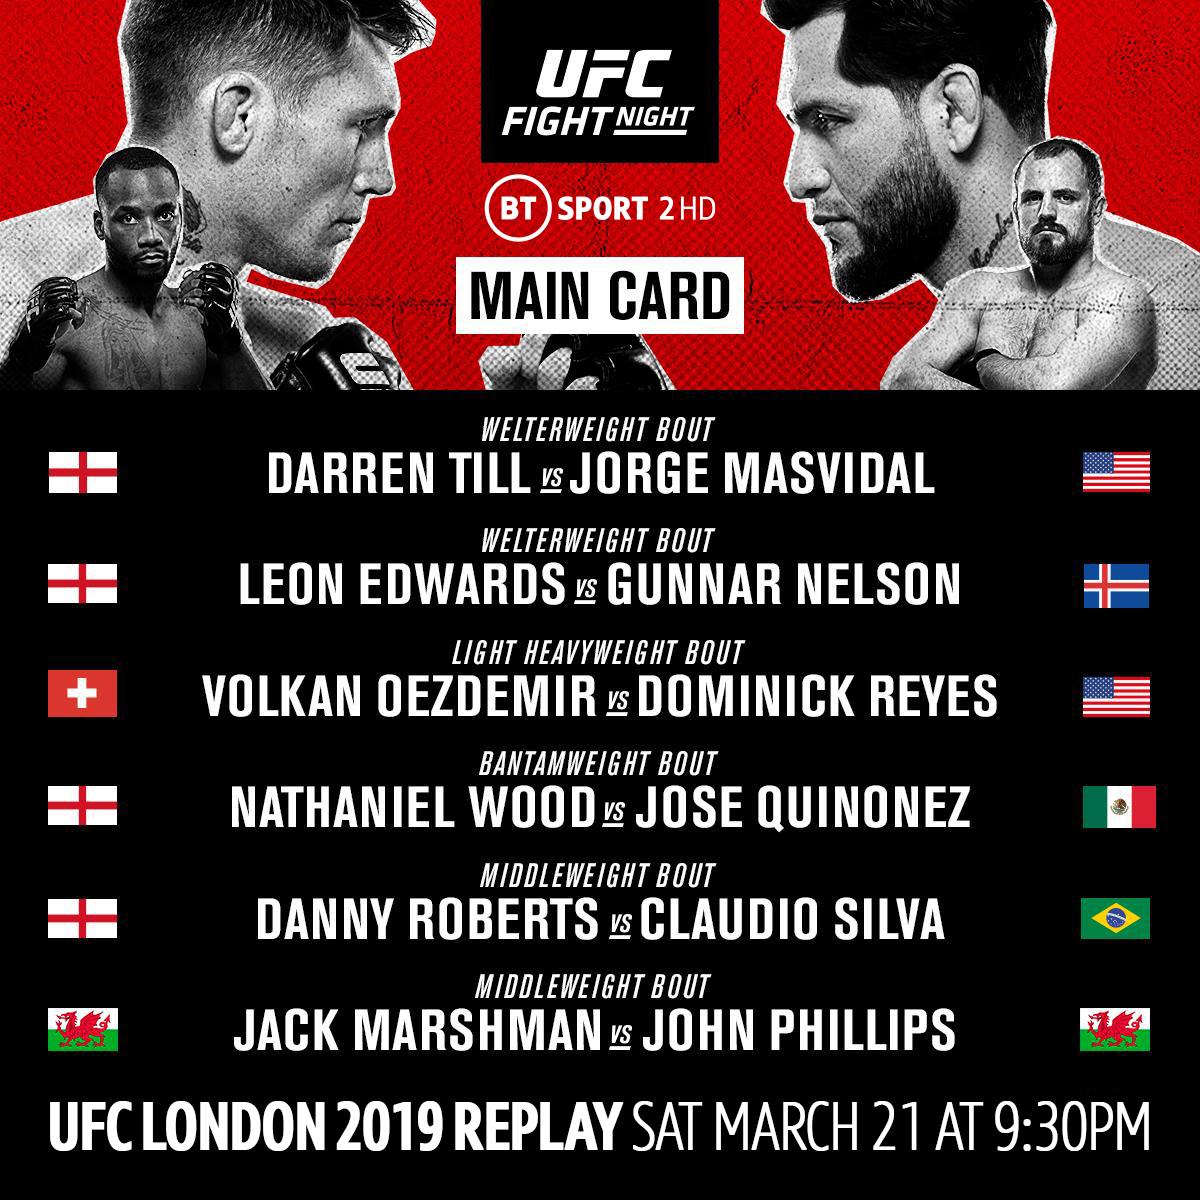 It's #UFCLondon Fight Day! 🇬🇧  Rewatch last year's epic main card tonight on @BTSport 2 at 9:30pm! https://t.co/vi0ujwyNOb